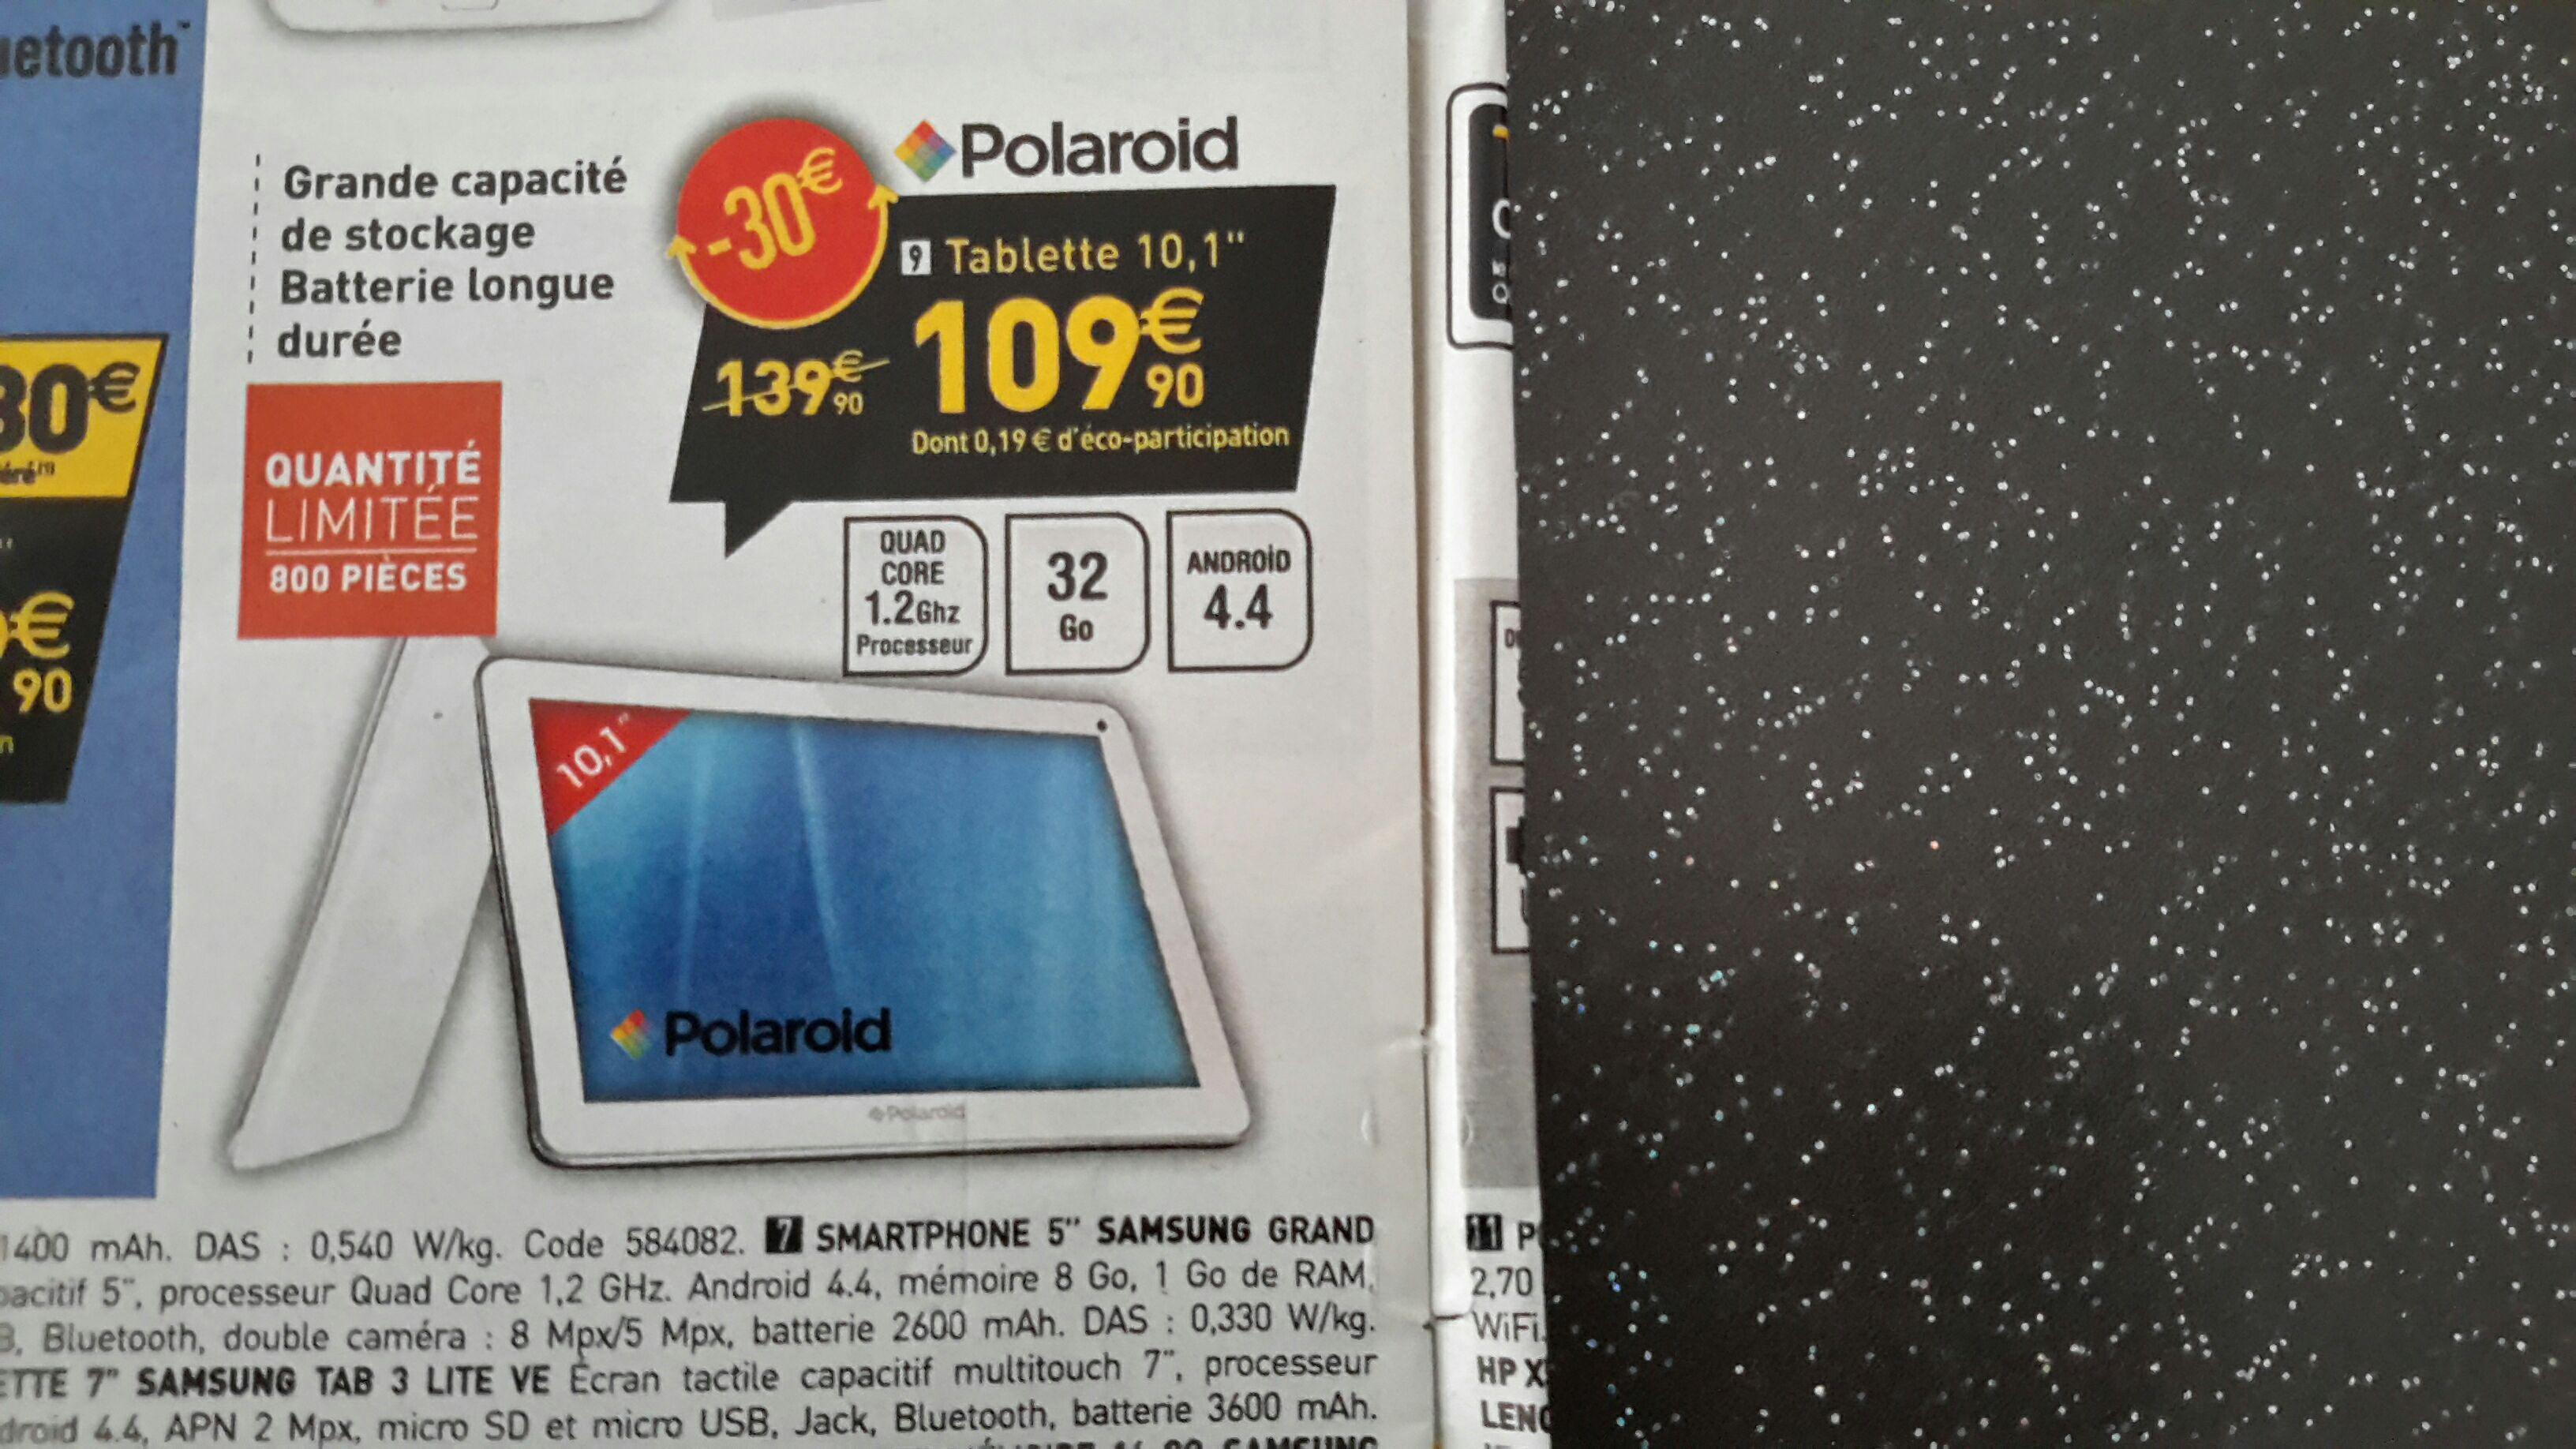 "Tablette 10."" Polaroid (Quad Core, Android 4.4, 32 Go Rom)"